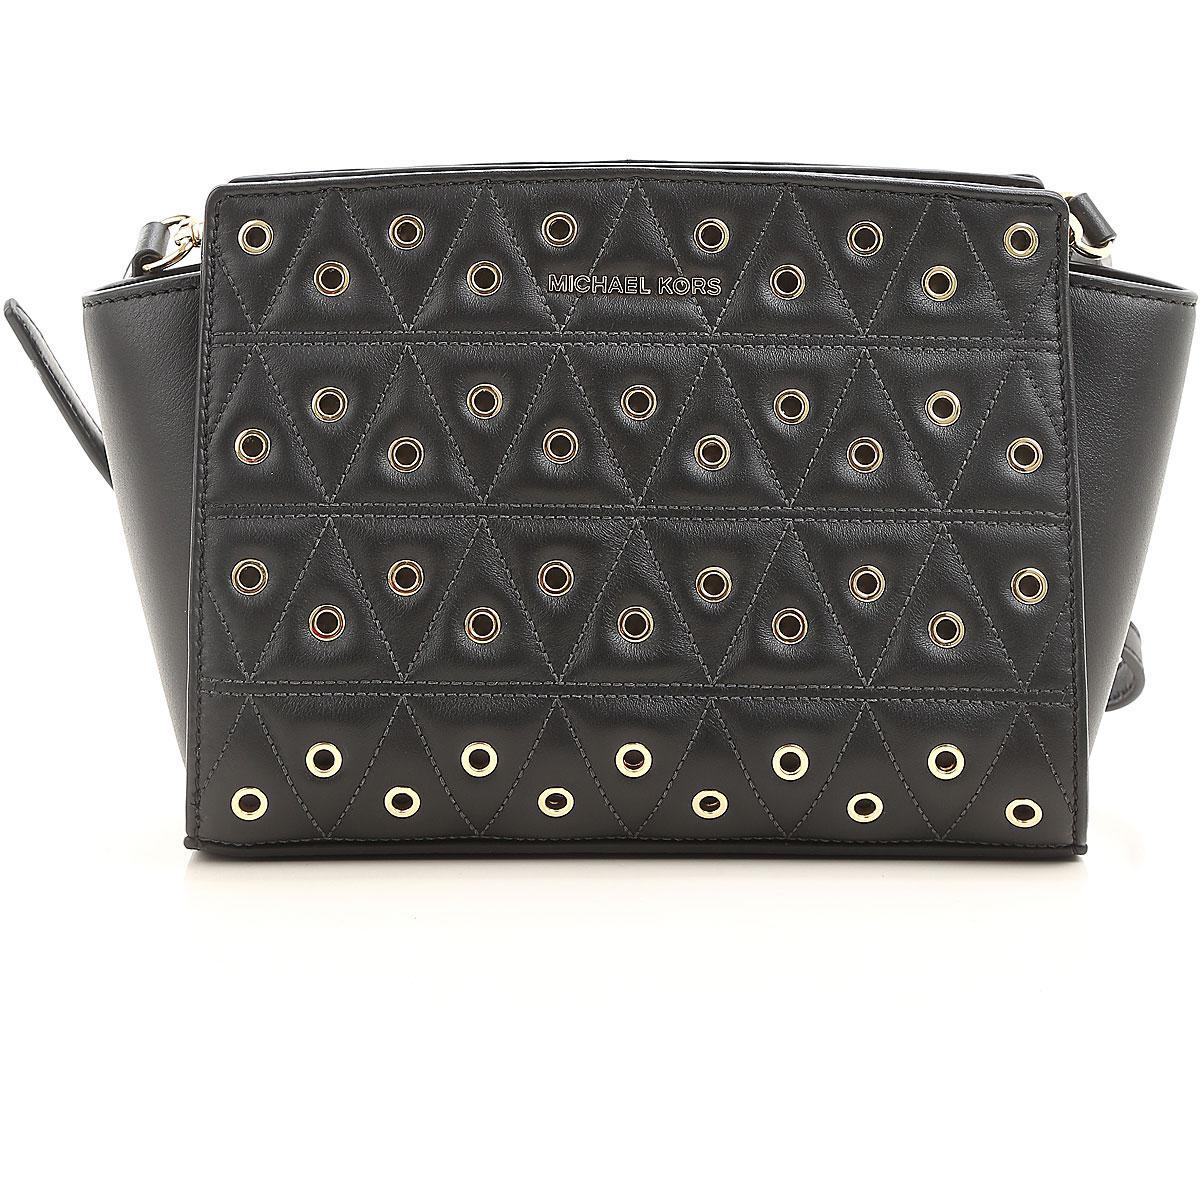 Michael Kors - Black Shoulder Bag For Women On Sale In Outlet - Lyst. View  fullscreen dc160f6f00